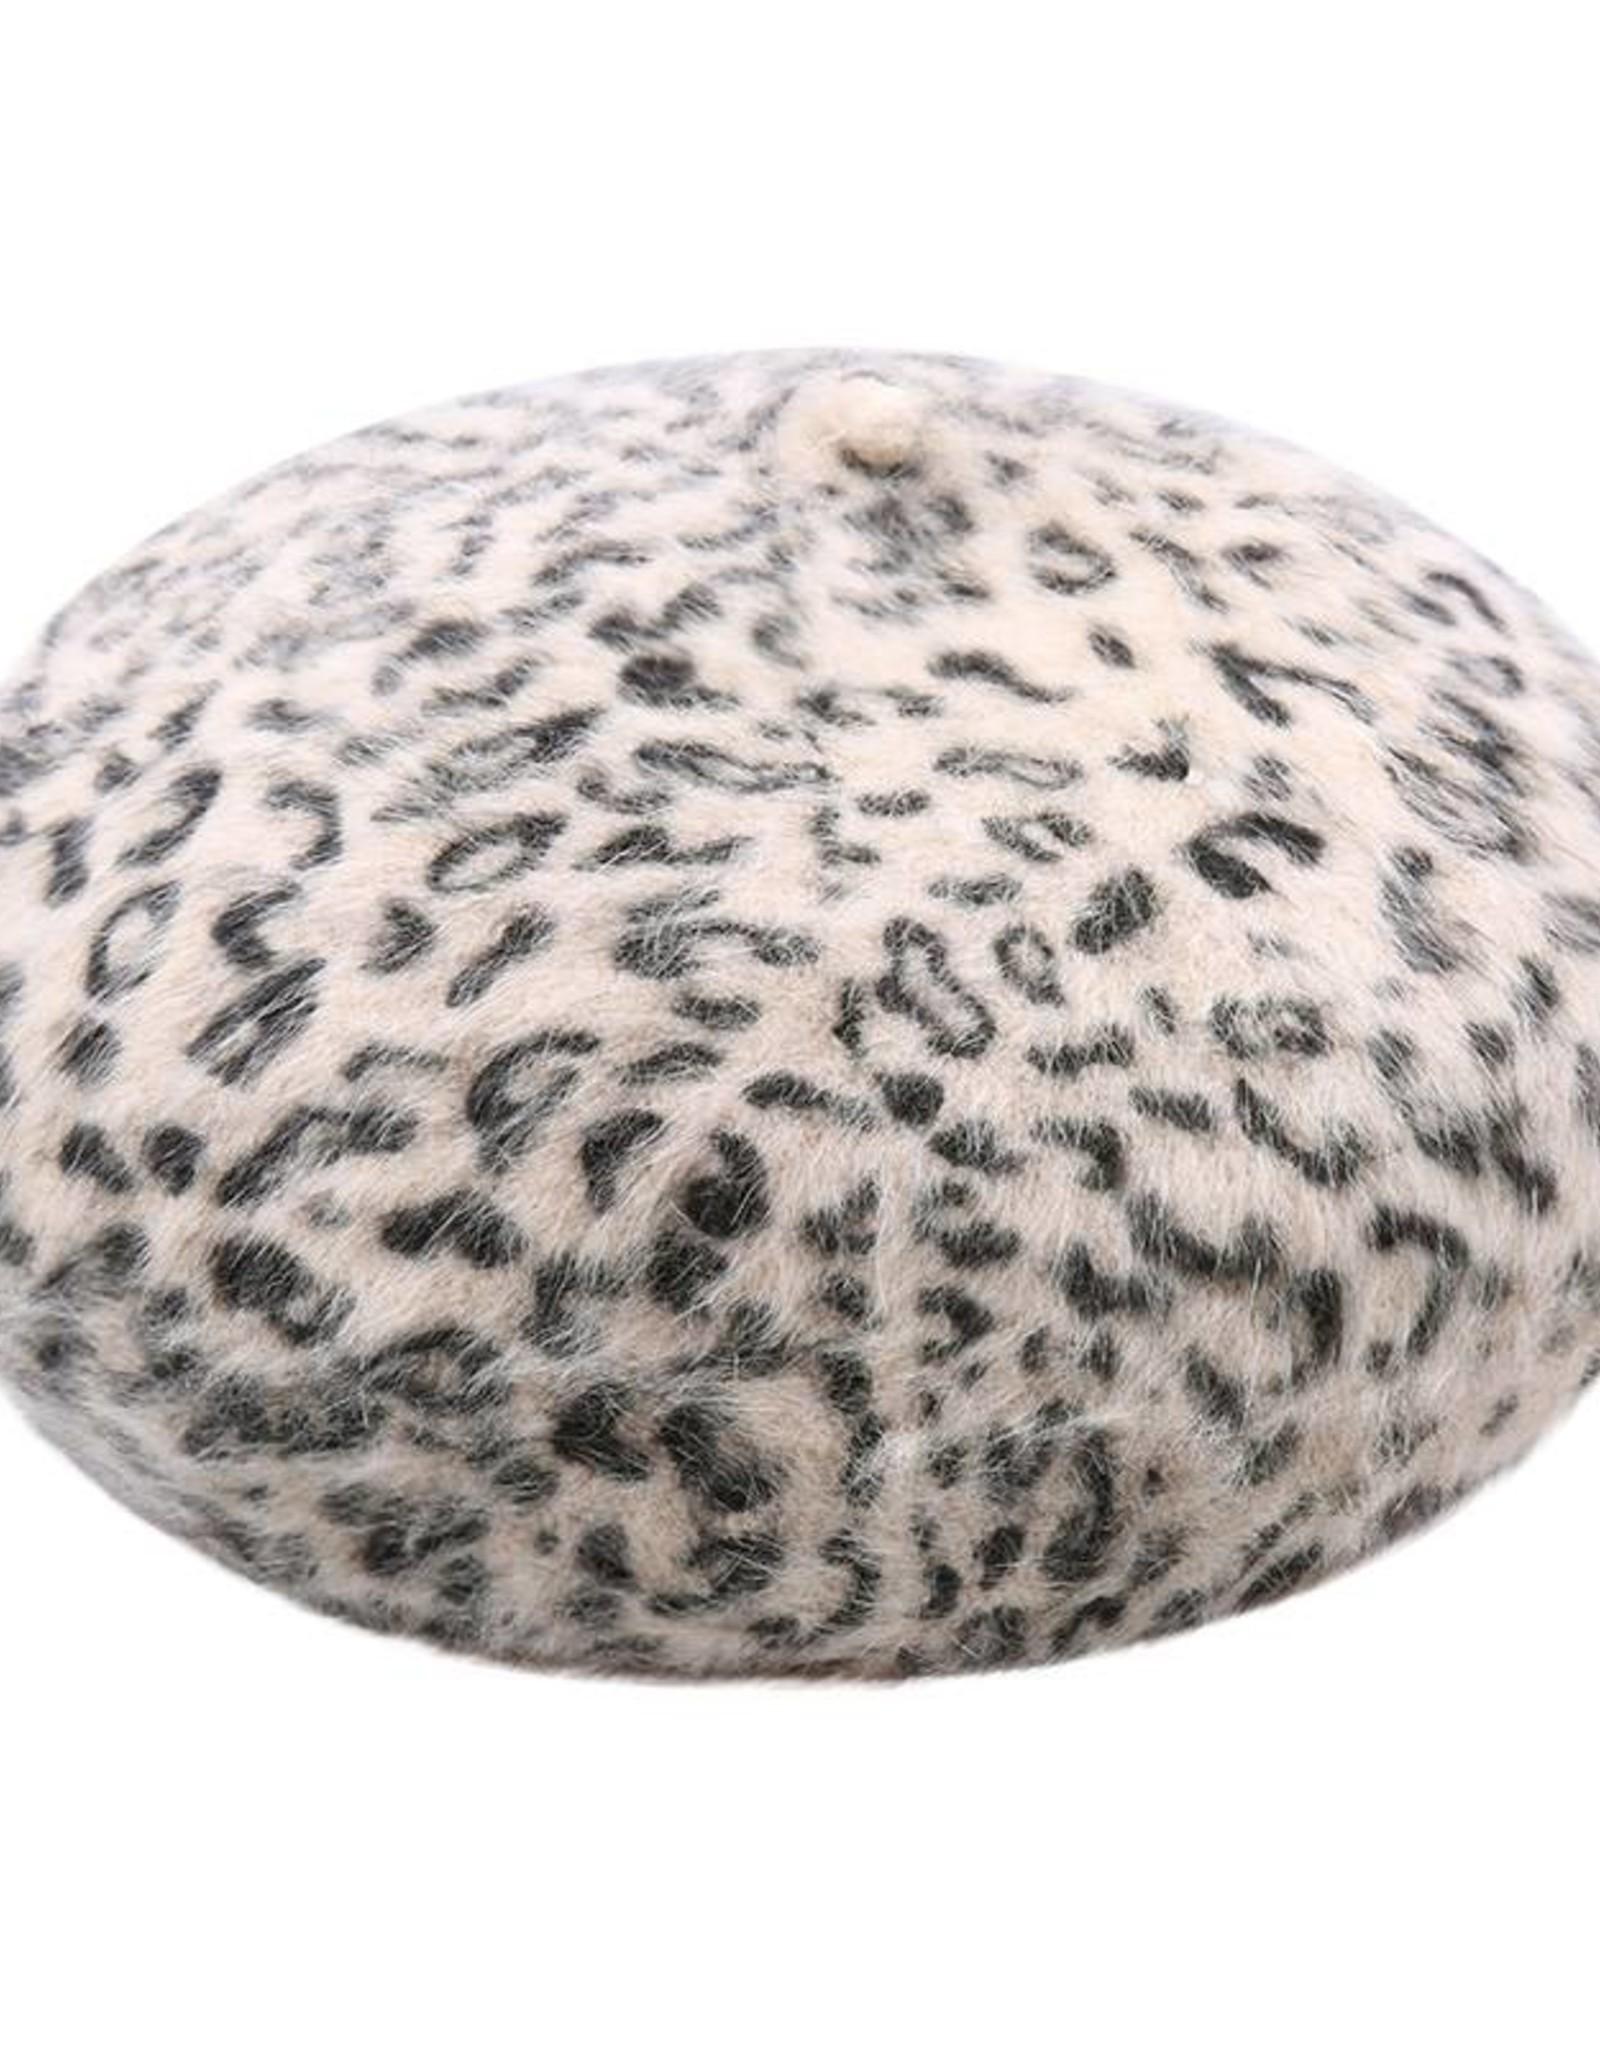 Baret Leopard Creme